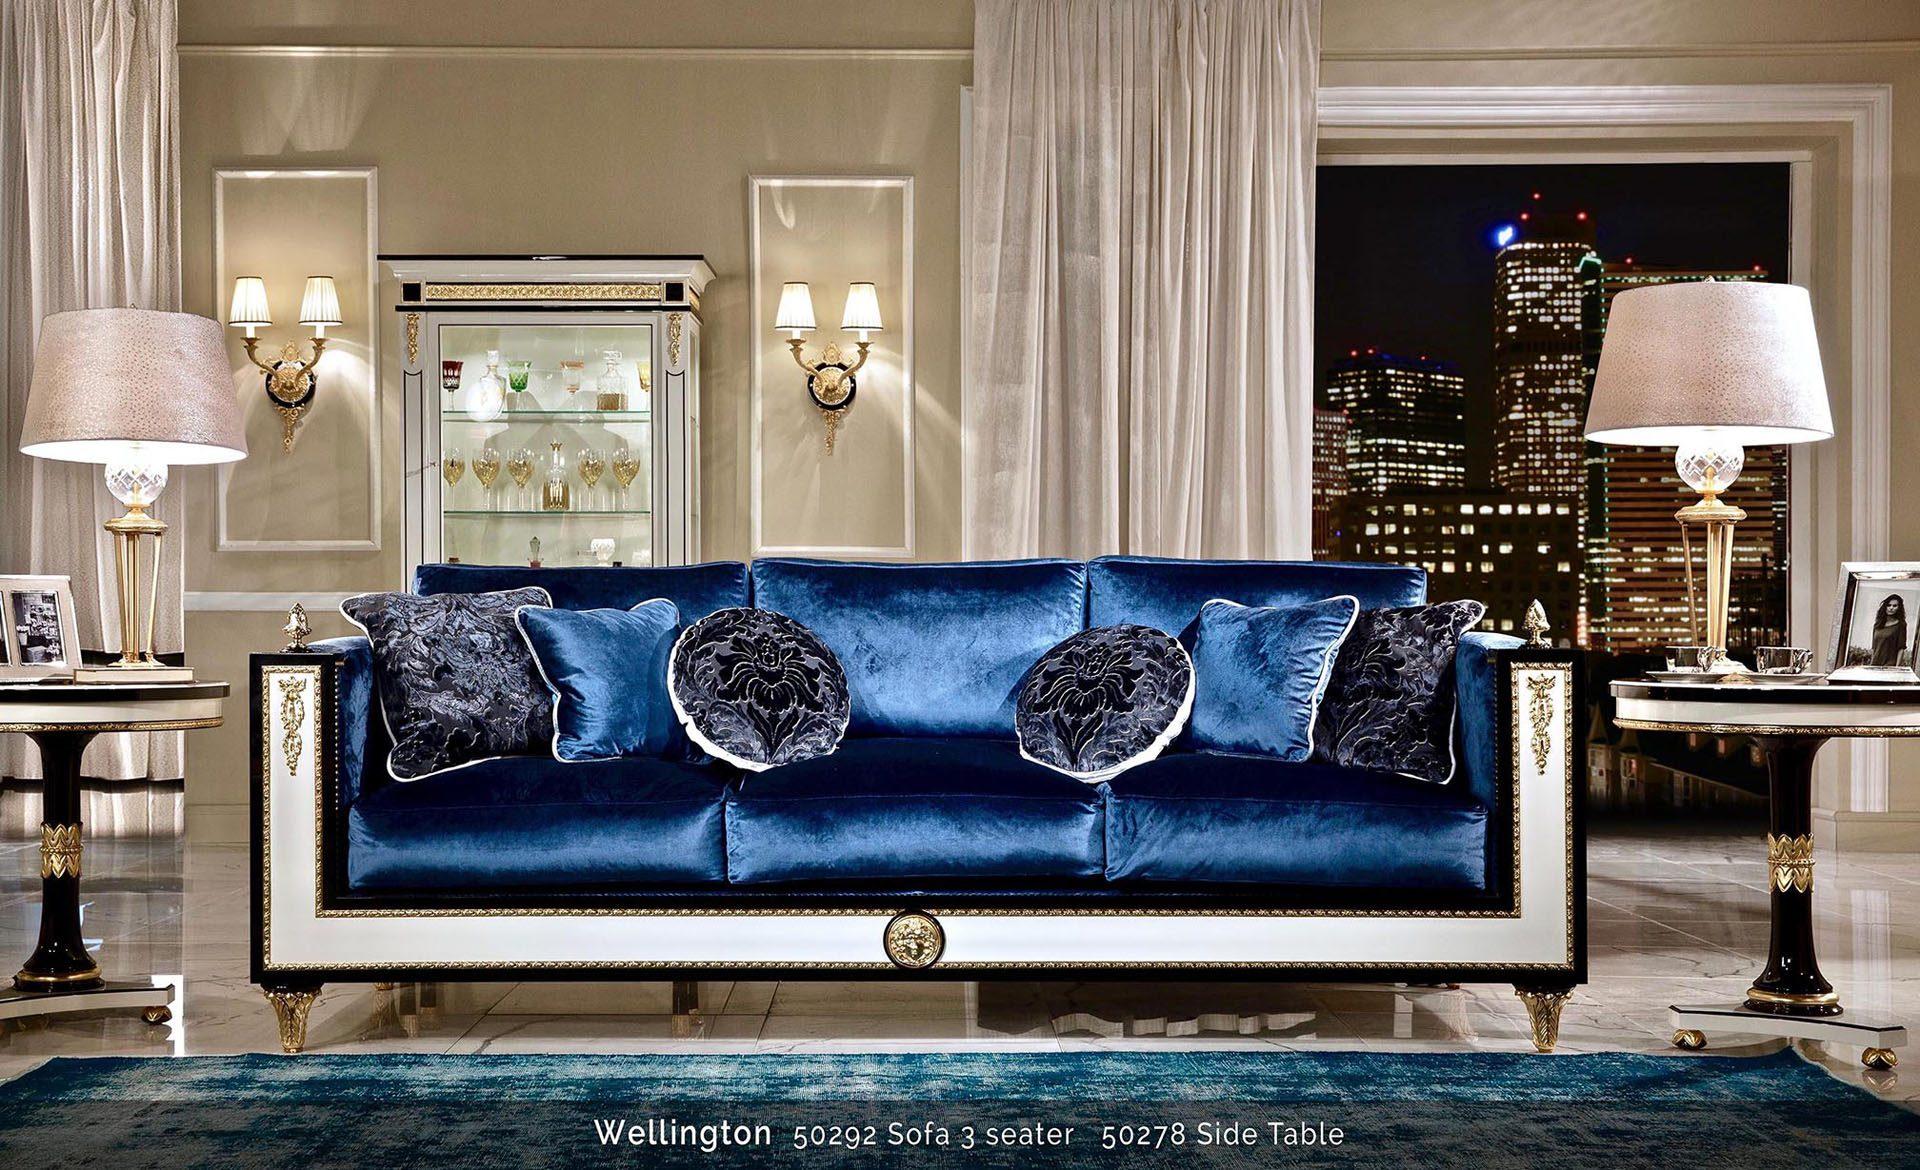 Wellington Lounge